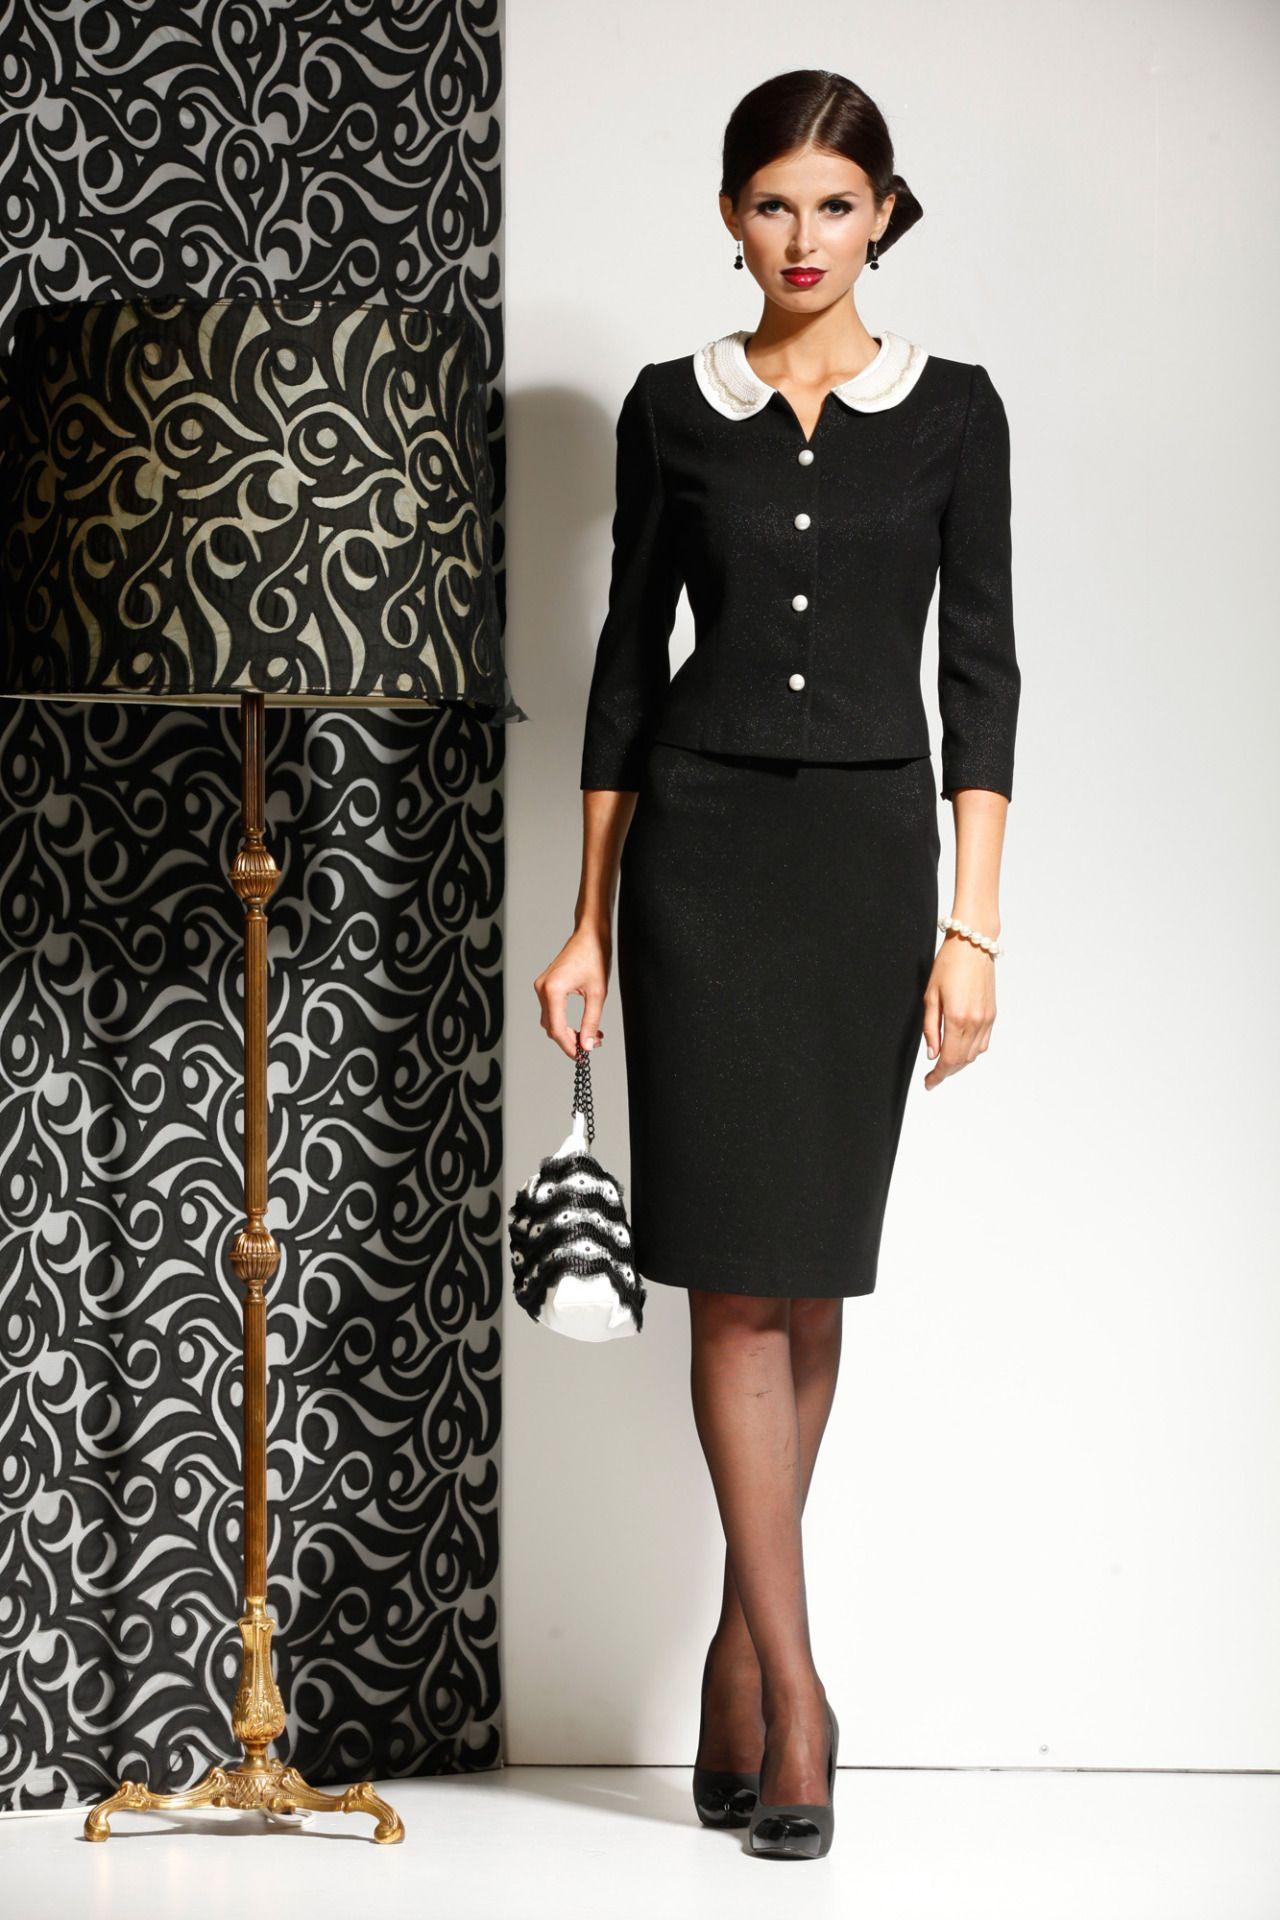 Best 25+ Women's skirt suits ideas on Pinterest | Skirt ...